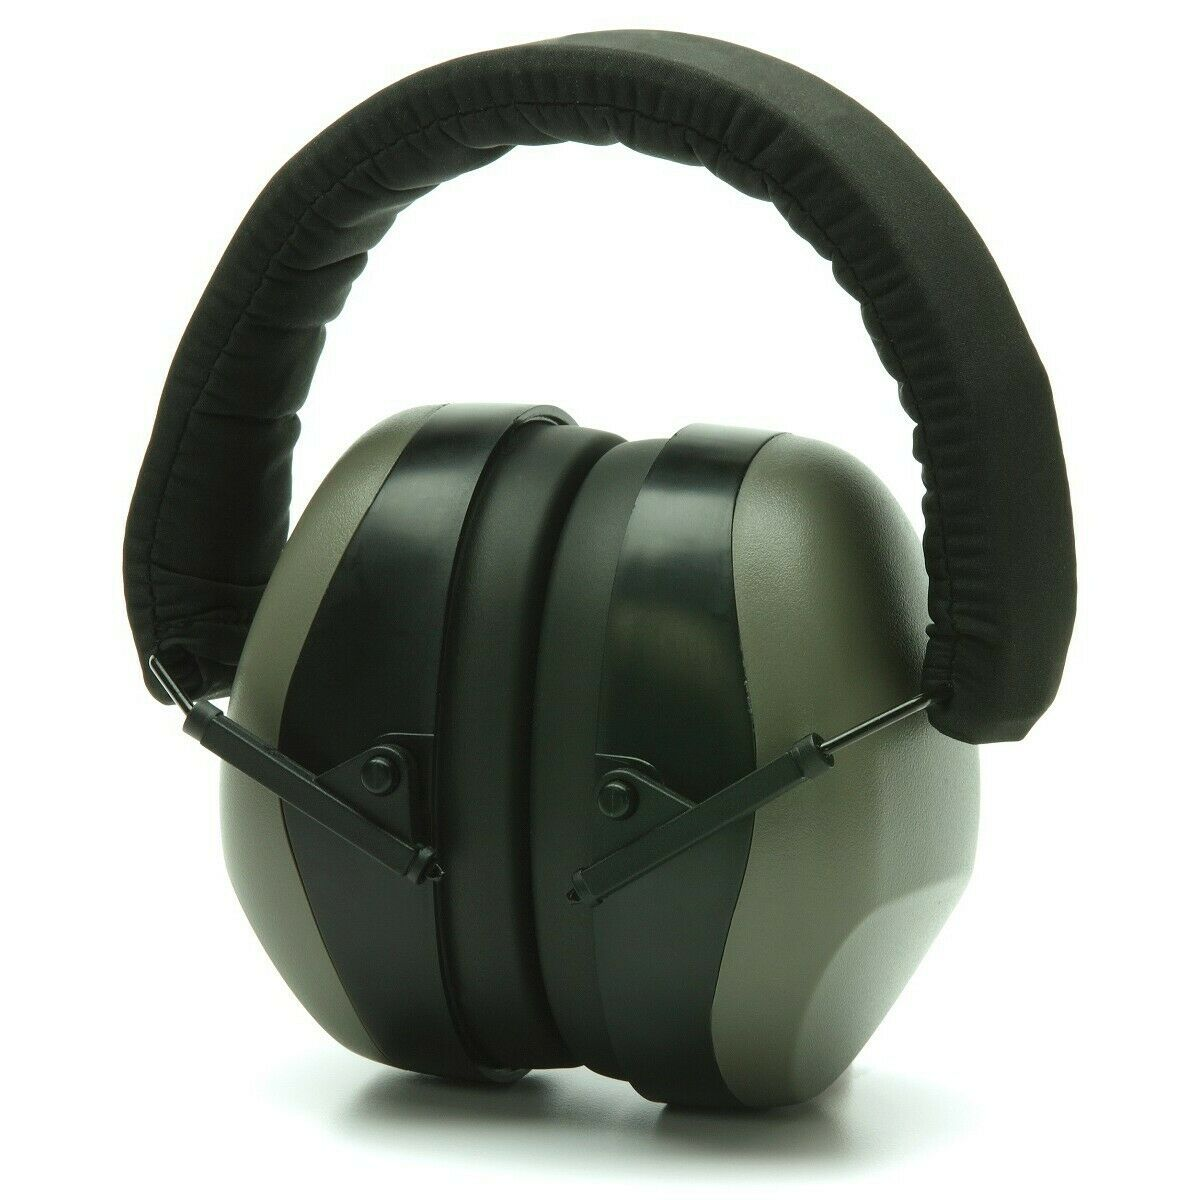 Pyramex PM8010 GRAY, PM80 Series Economy Ear Muffs – 26dB NRR Business & Industrial